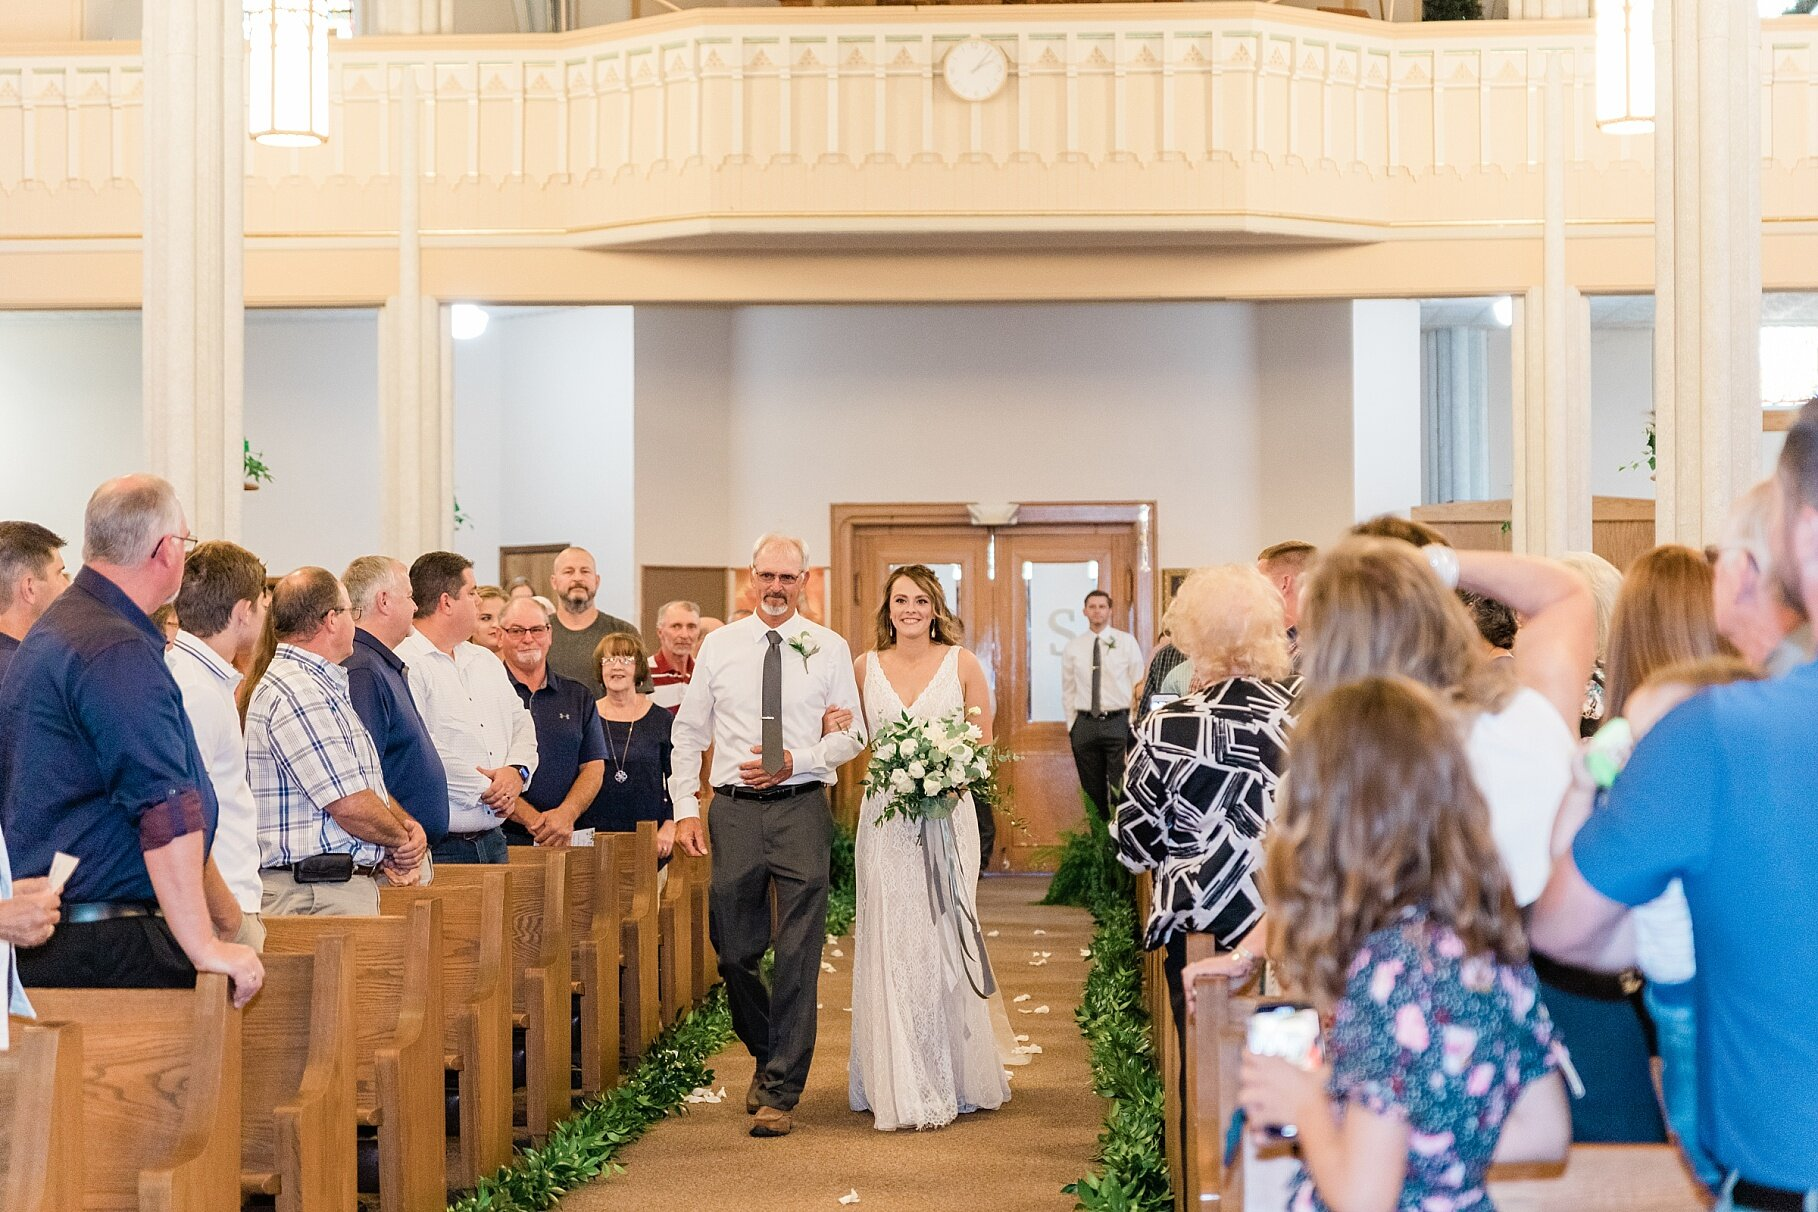 Earth-Toned Wedding by KKP Associate Wedding Photographer and Kelsi Kliethermes Photography Best Columbia Missouri Wedding Photographer_0024.jpg